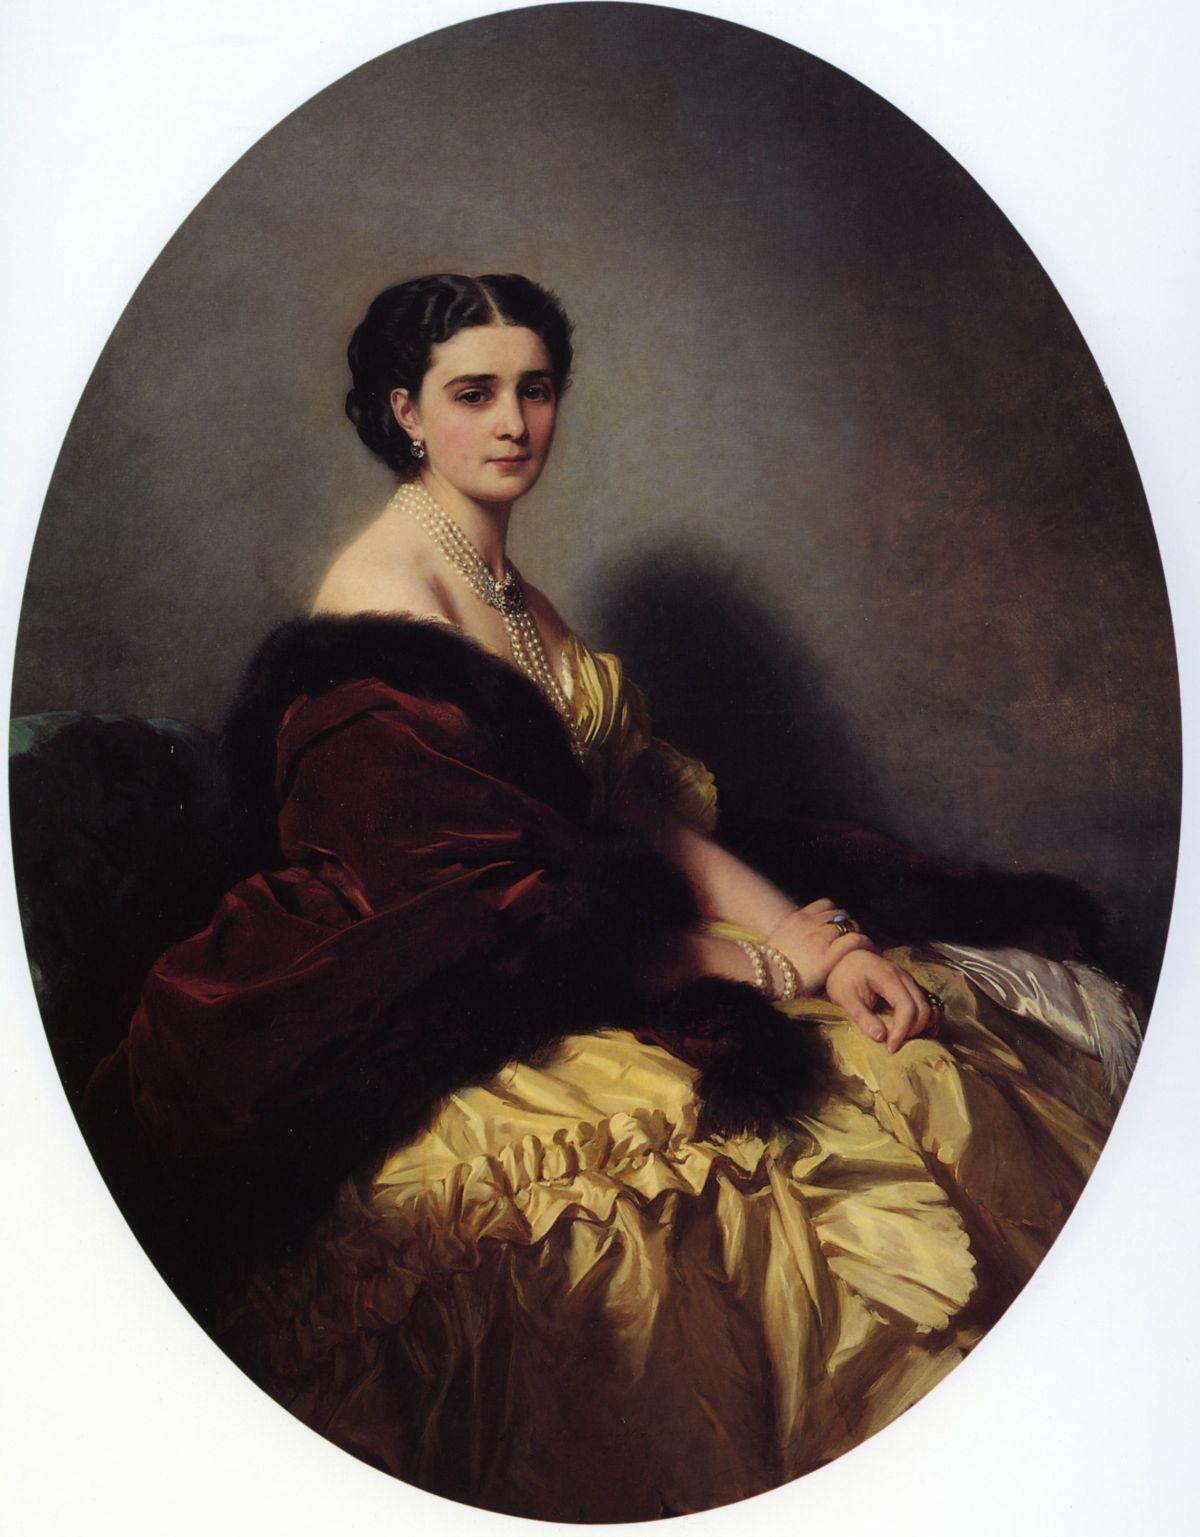 Madame-Sofya-Petrovna-Naryschkina-by-Franz-Xavier-Winterhalter